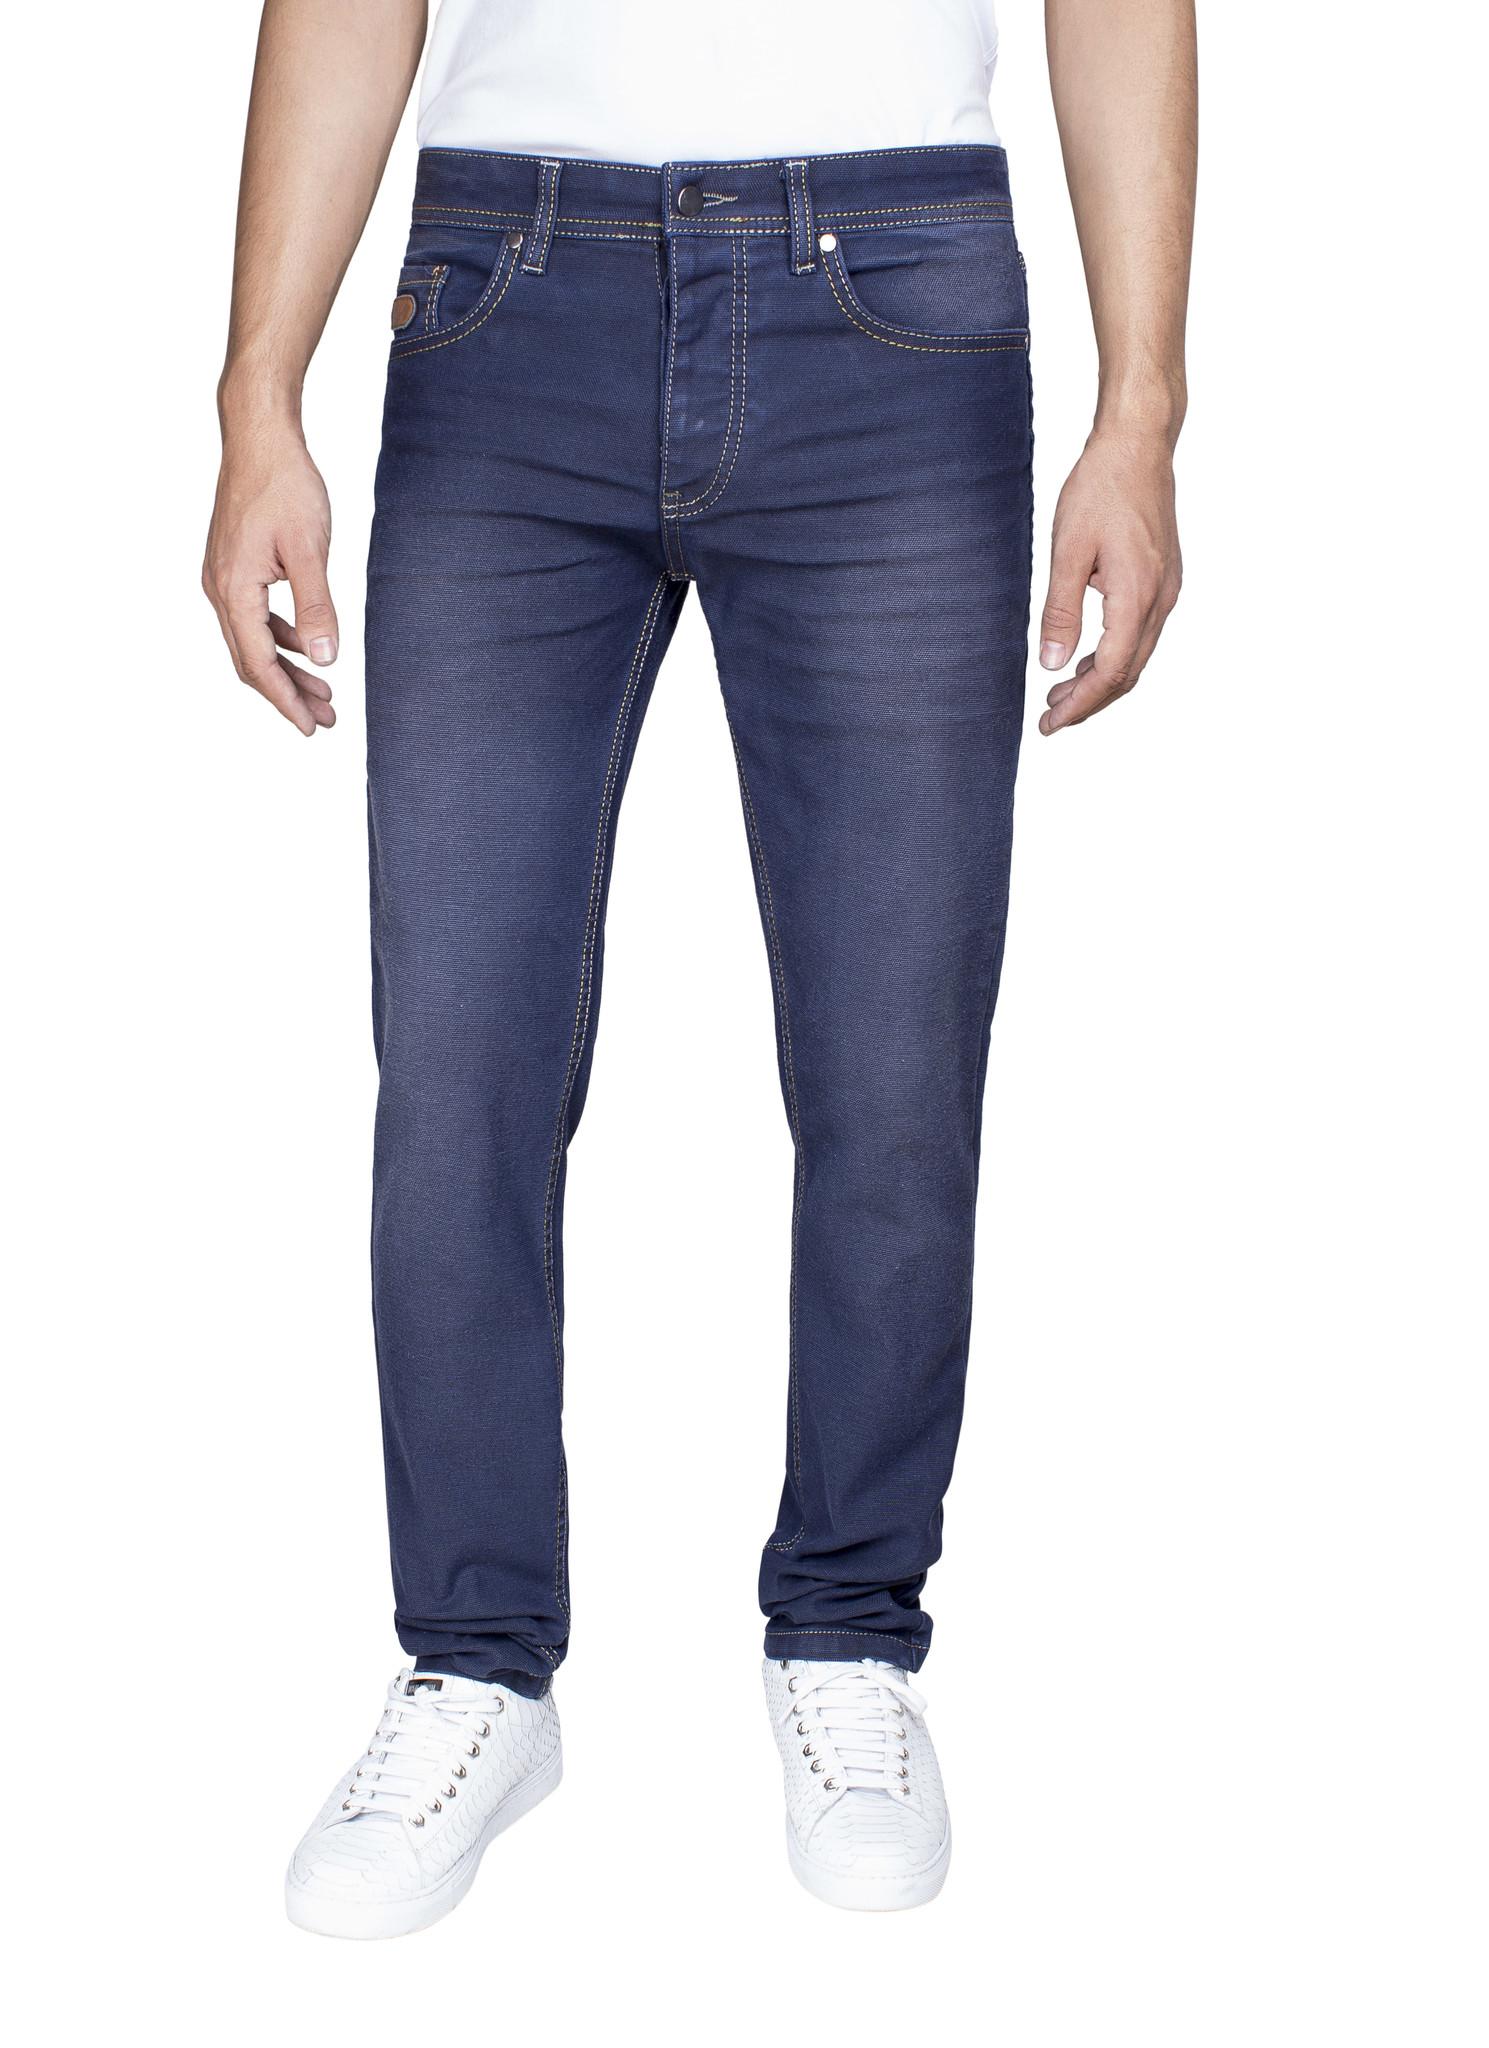 Arya Boy Jeans 82054 Navy L34 Maat: 29/34